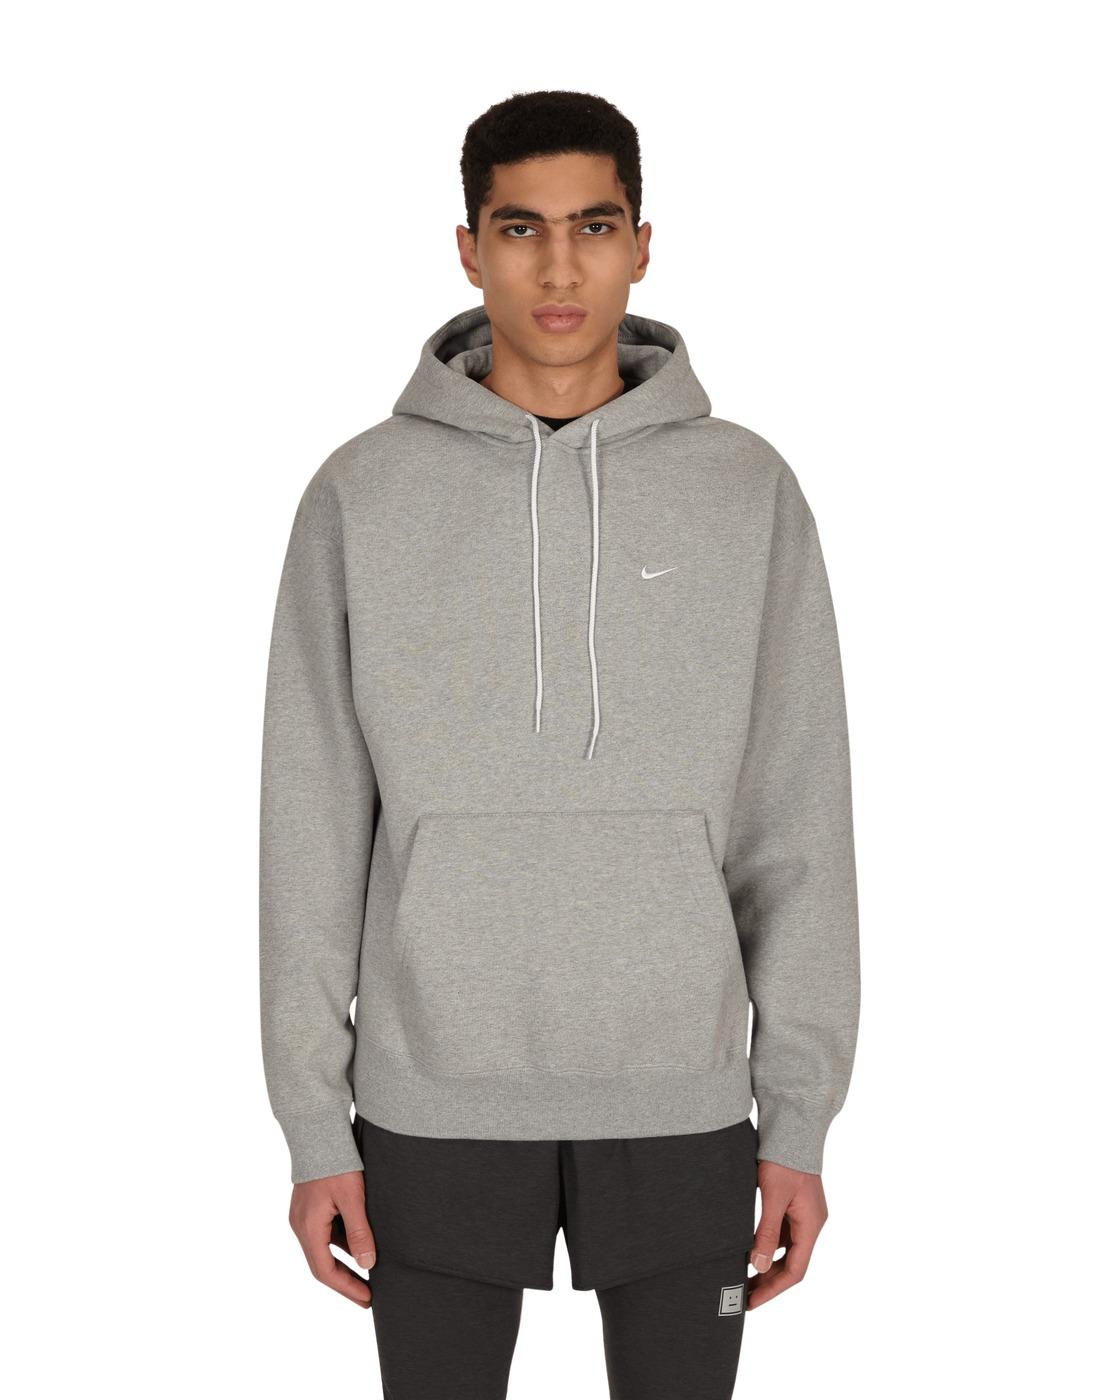 Nike Special Project Logo Hooded Sweatshirt Dk Grey Heather/White